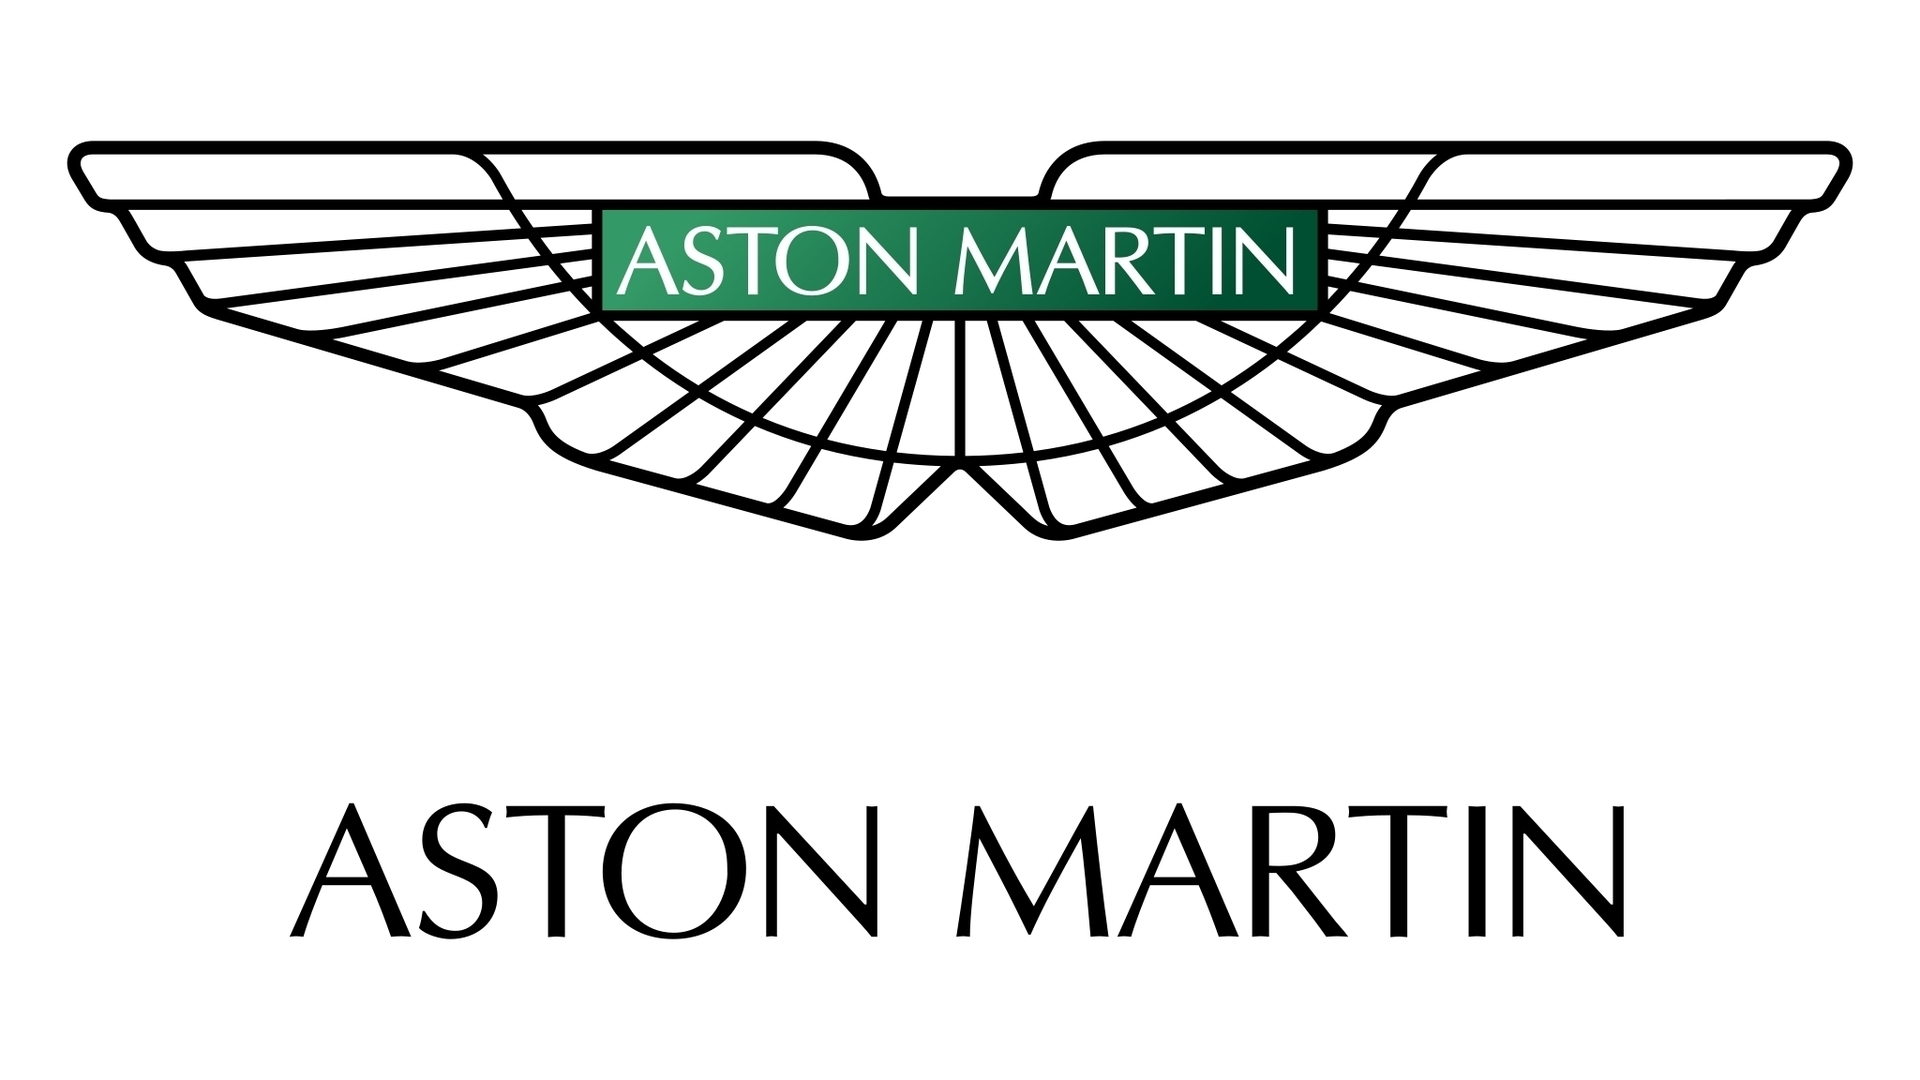 aston martin emblem